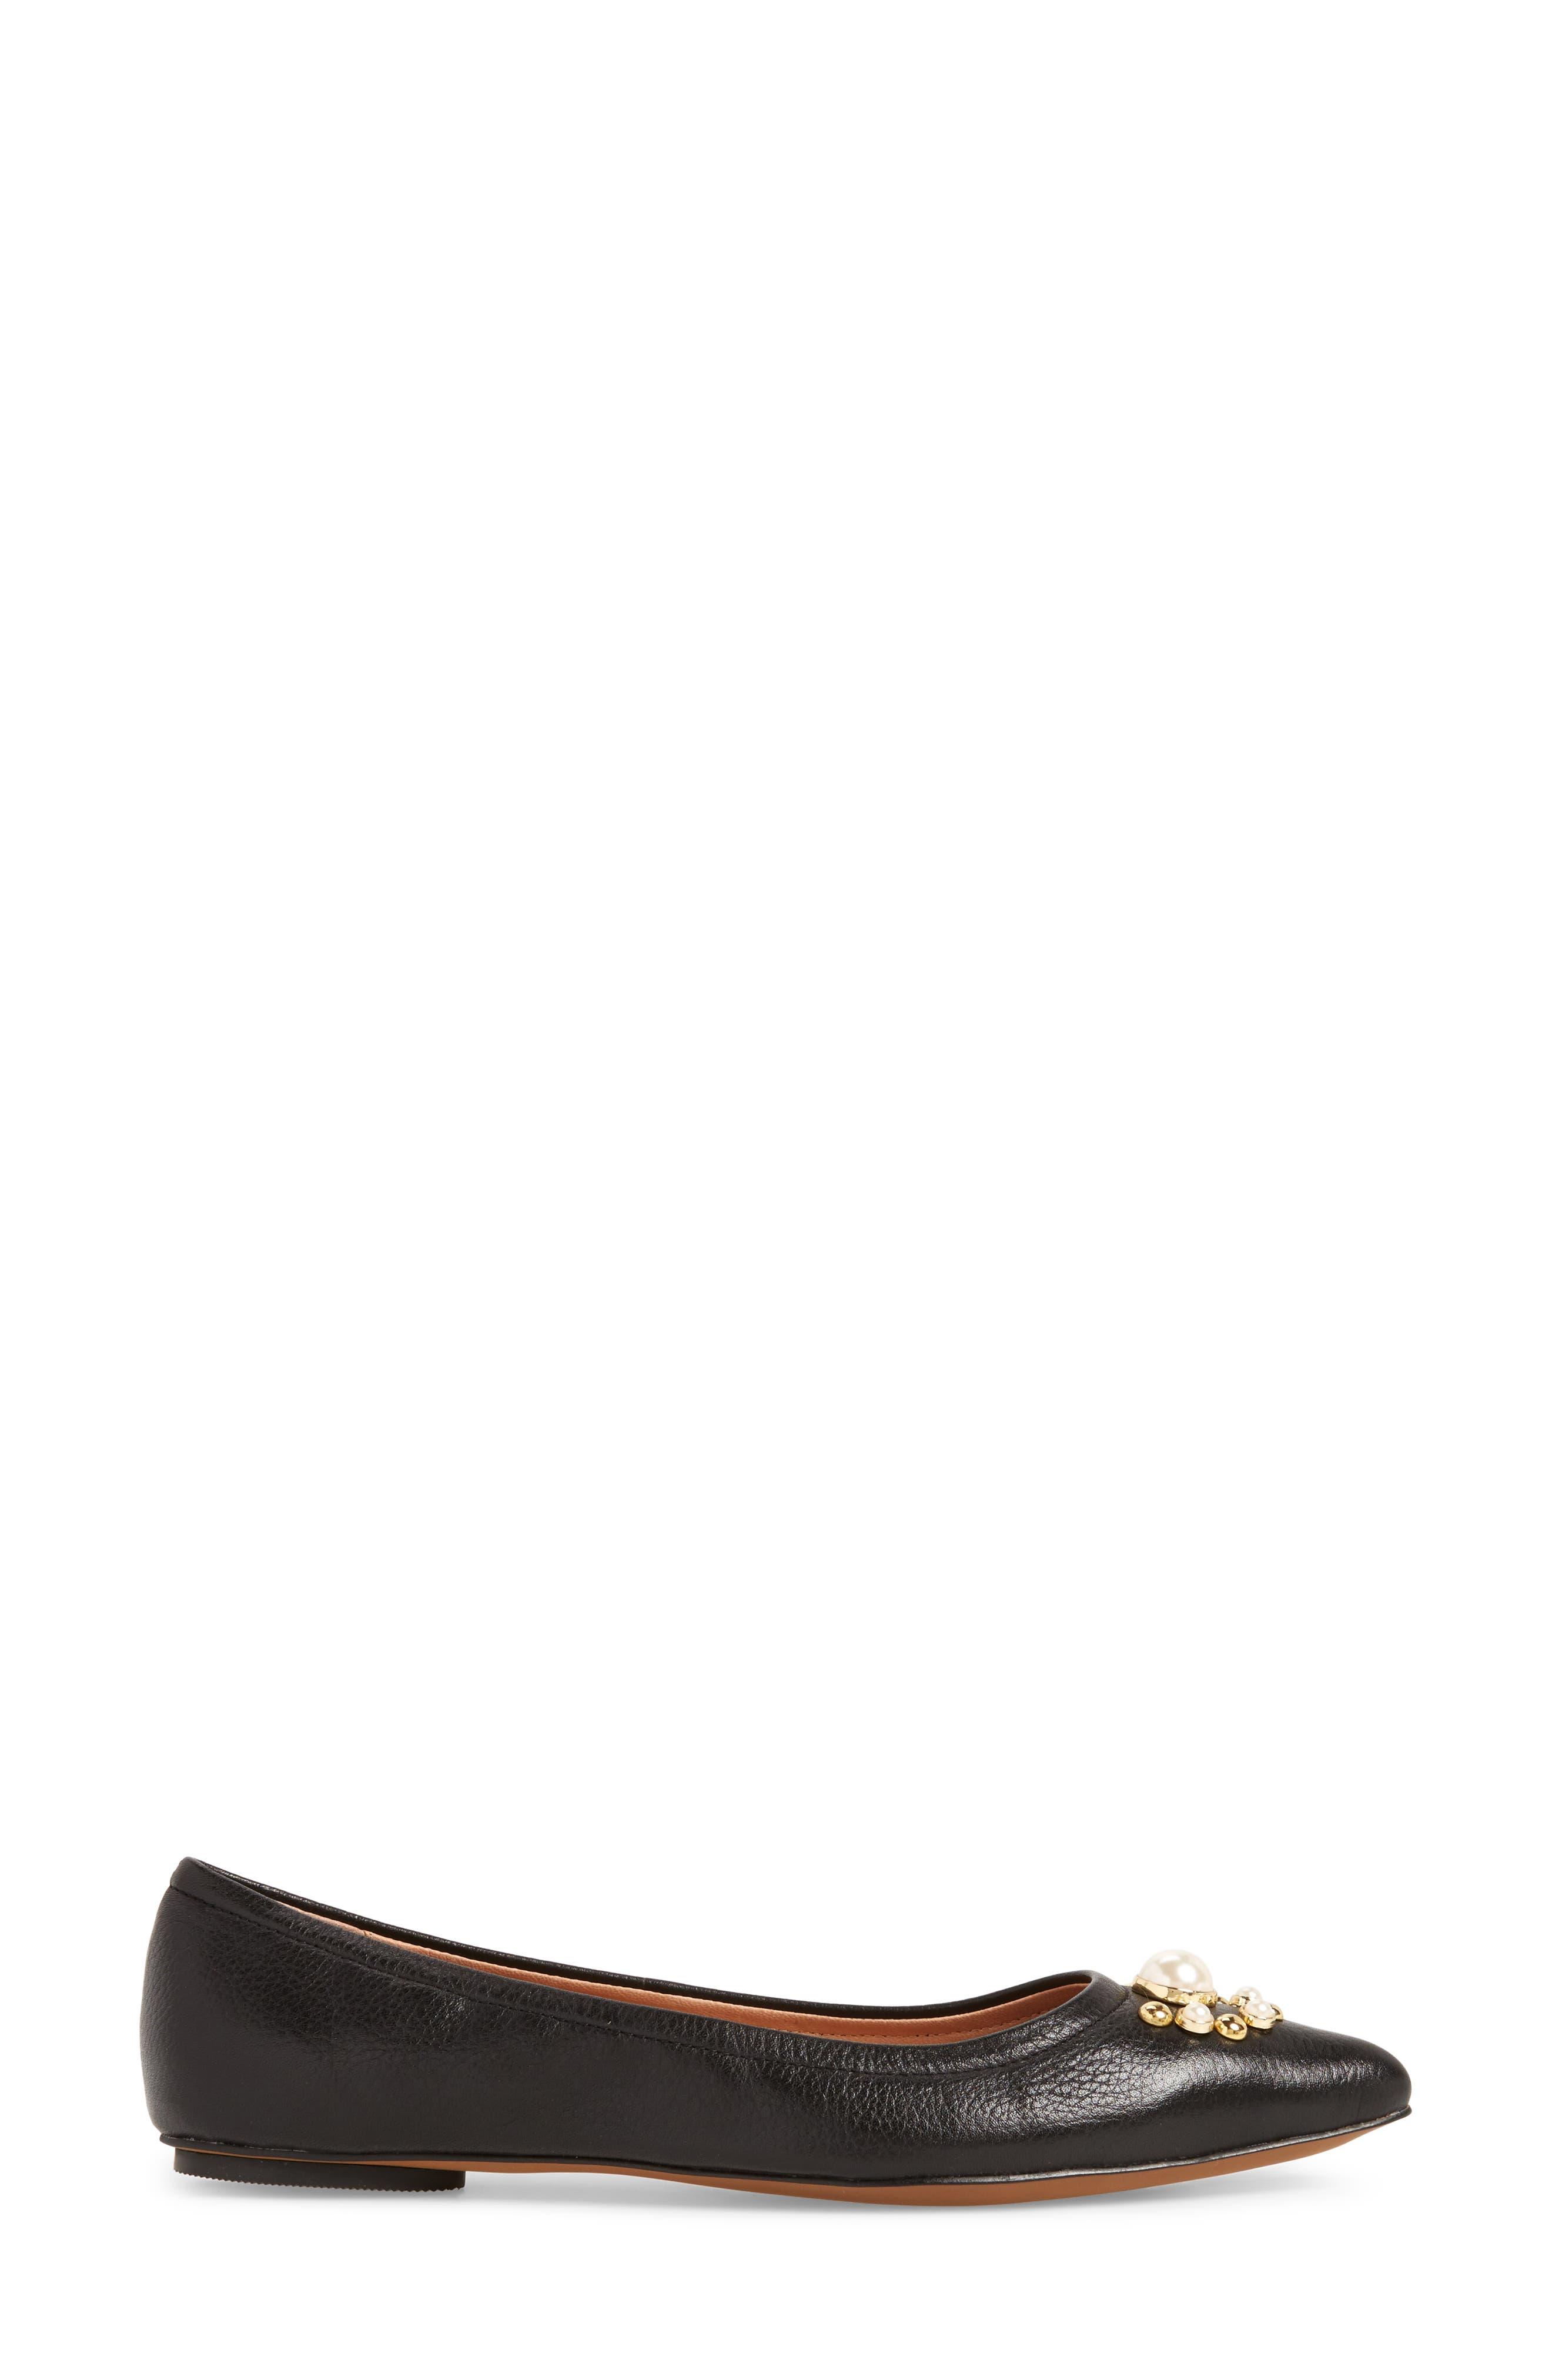 Alternate Image 3  - Linea Paolo Nadia Embellished Pointy Toe Flat (Women)